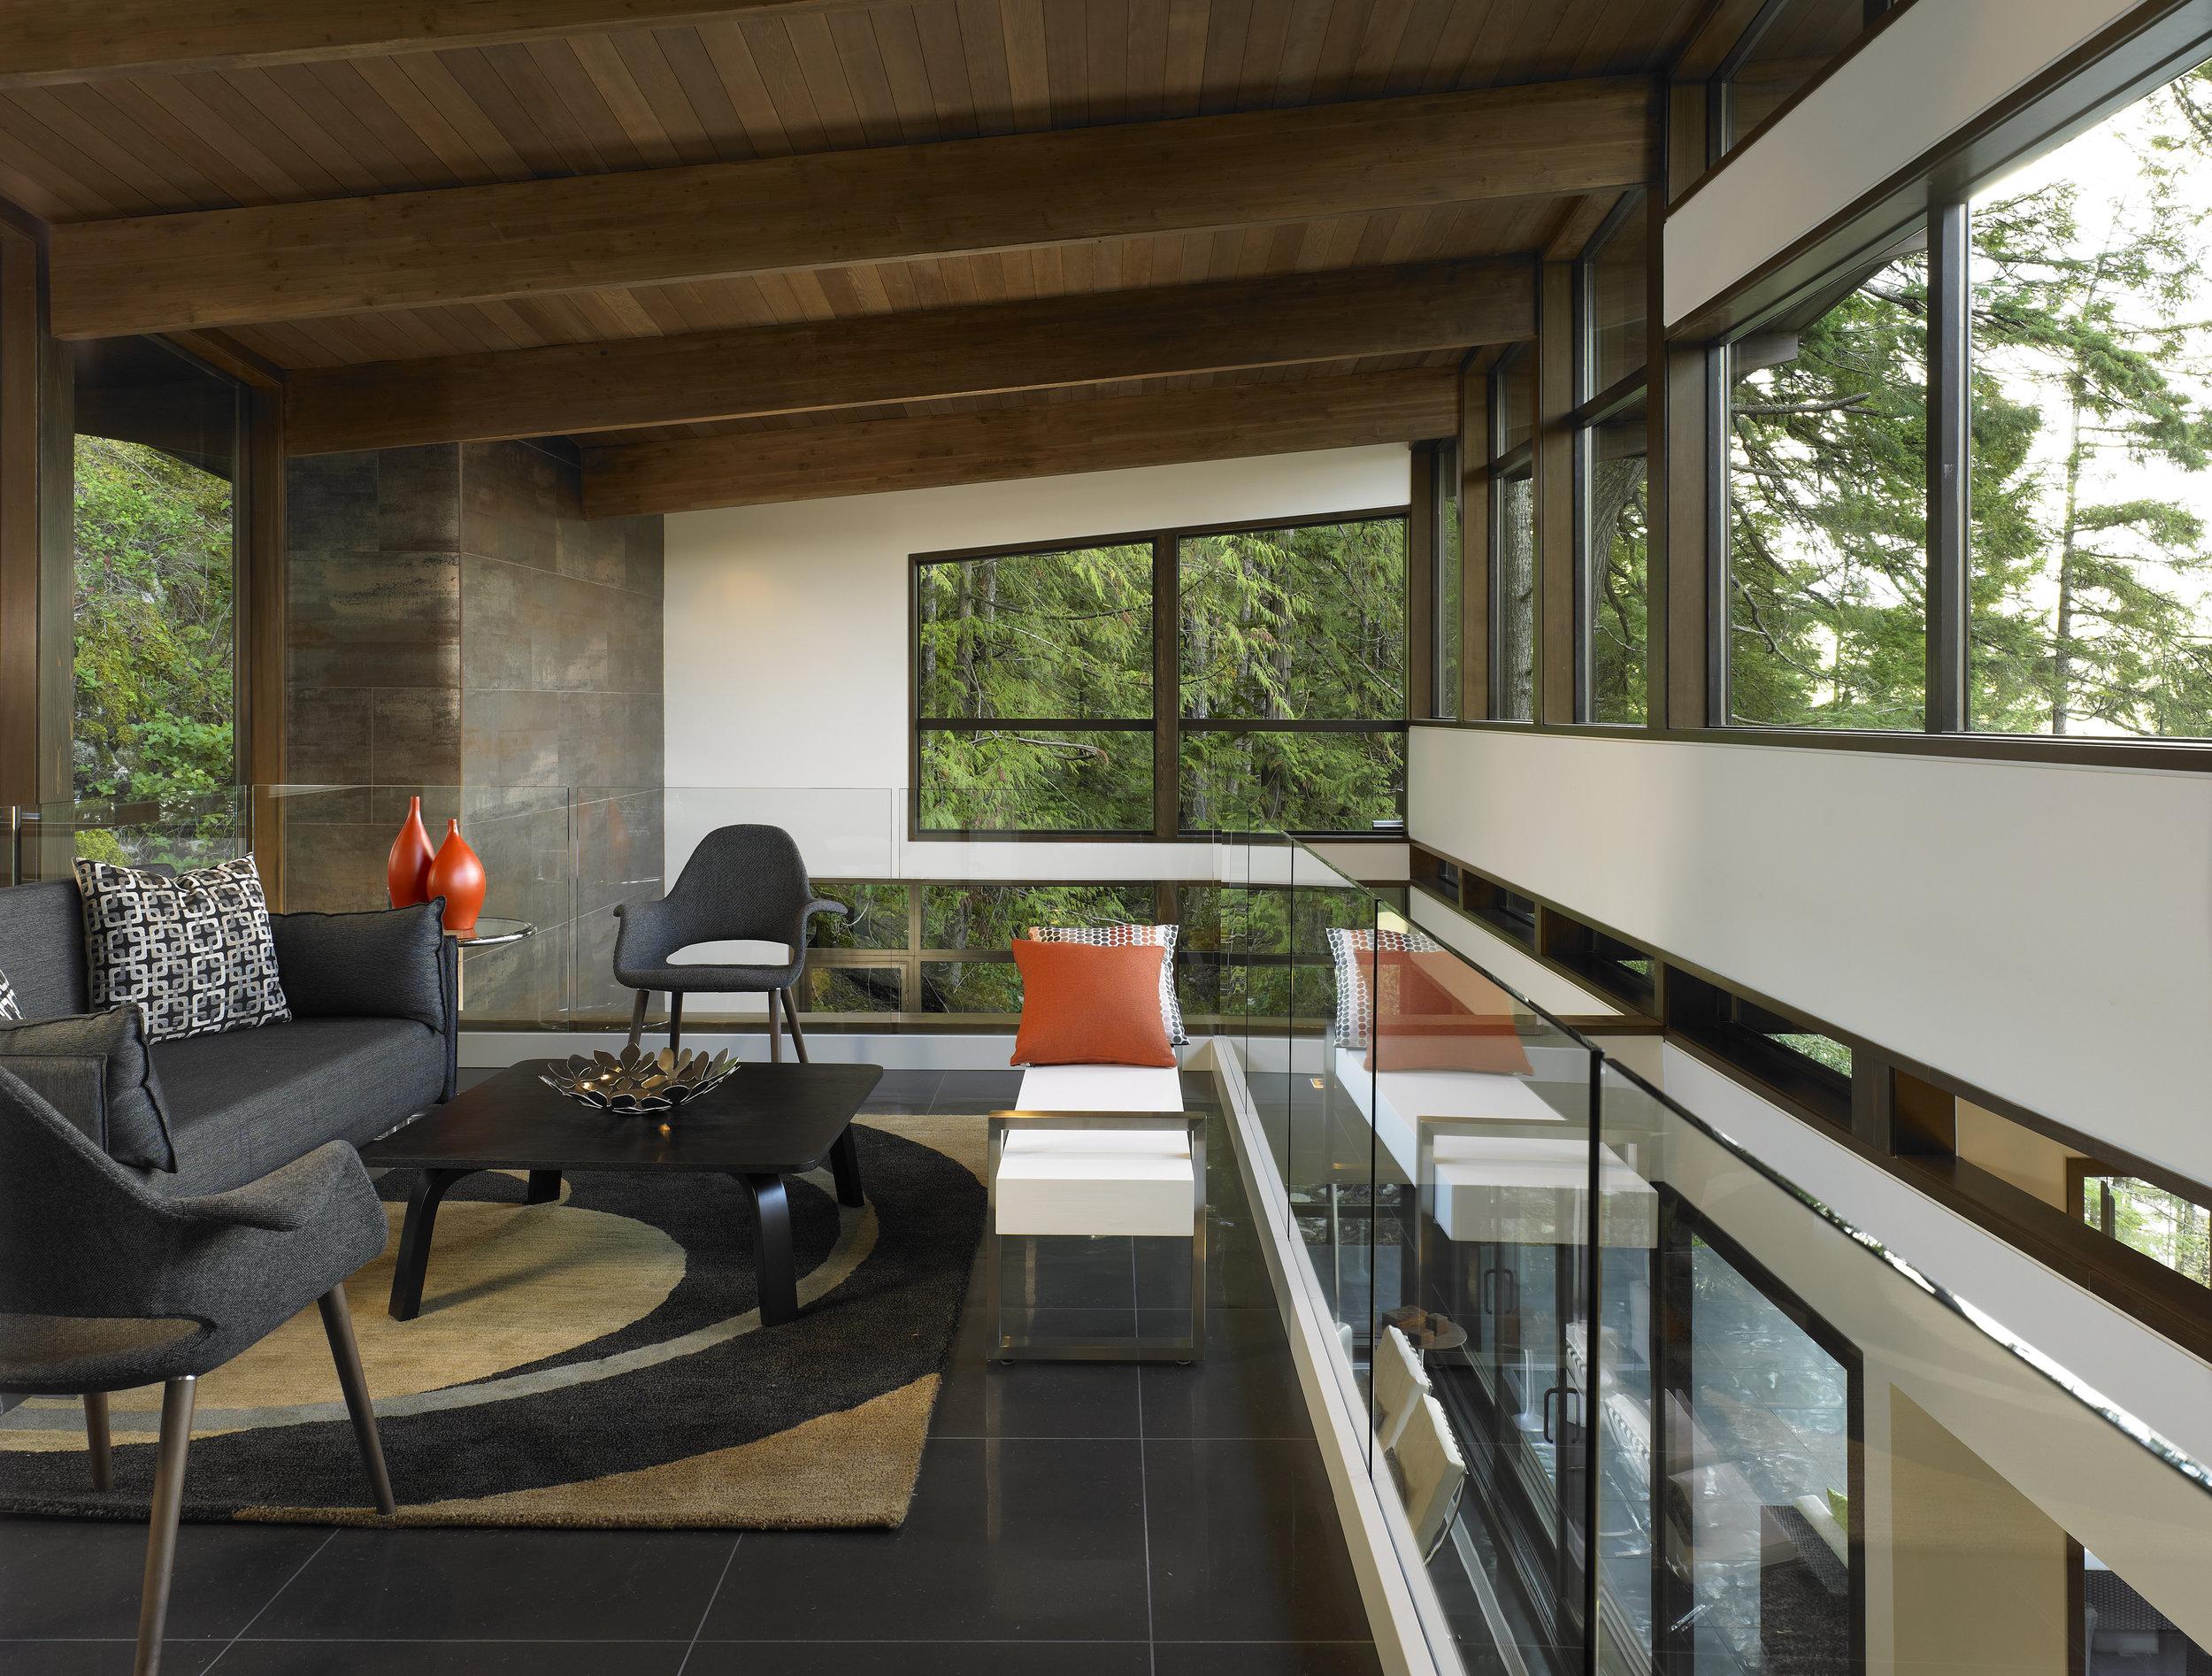 turkel_modern_design_prefab_gambier_island_house_living_space_interior.jpg